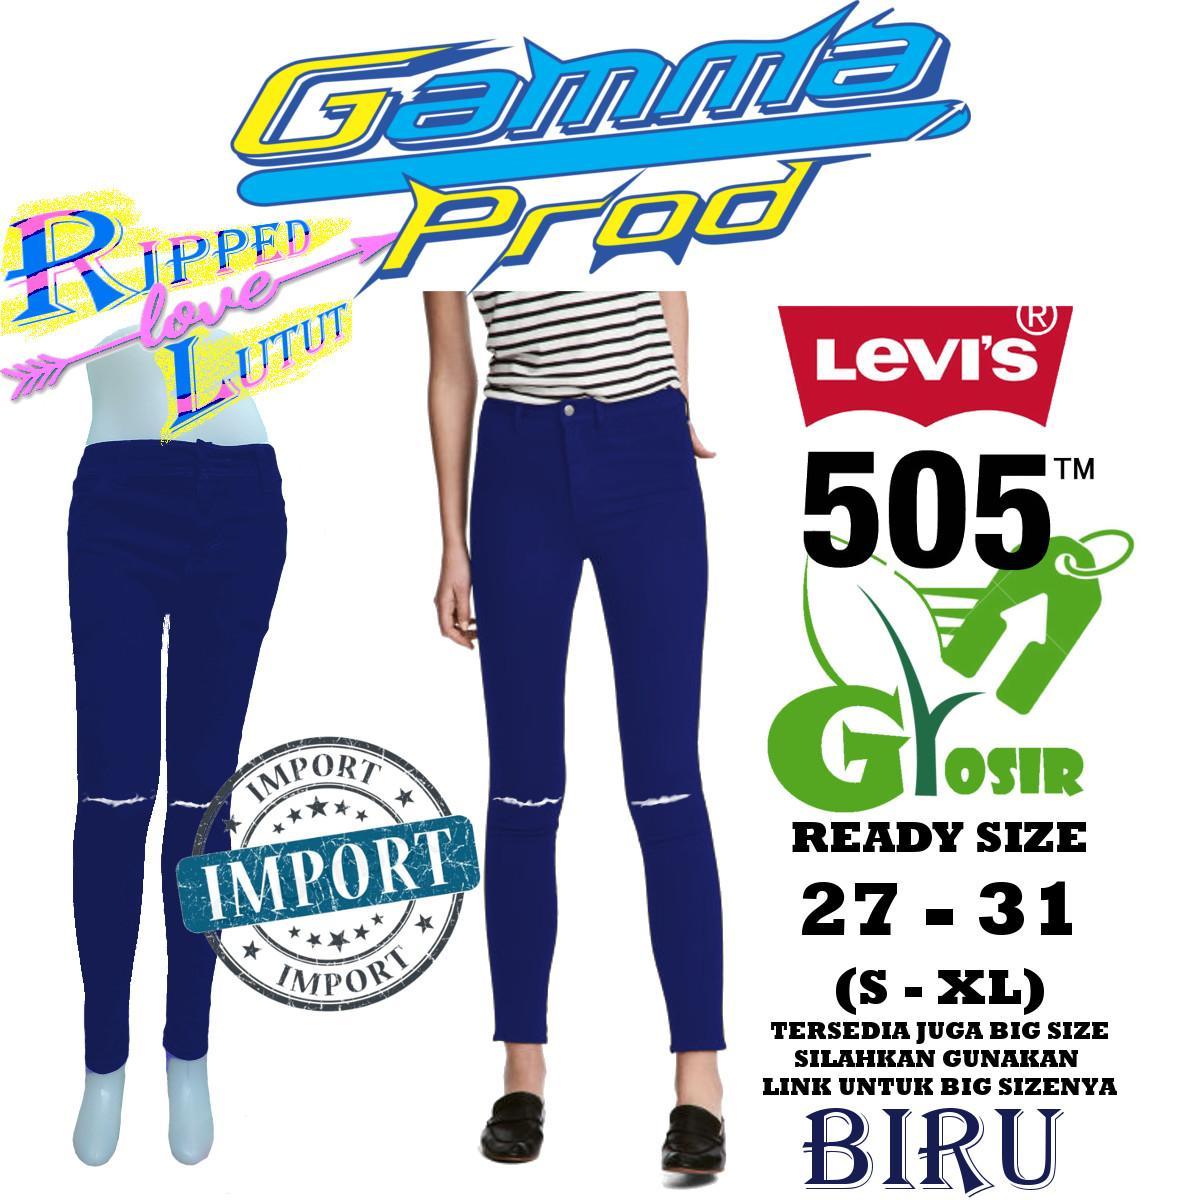 Celana Skinny Soft Jeans WANITA RIPPED LUTUT LEVIS 505 BIRU GROSIR